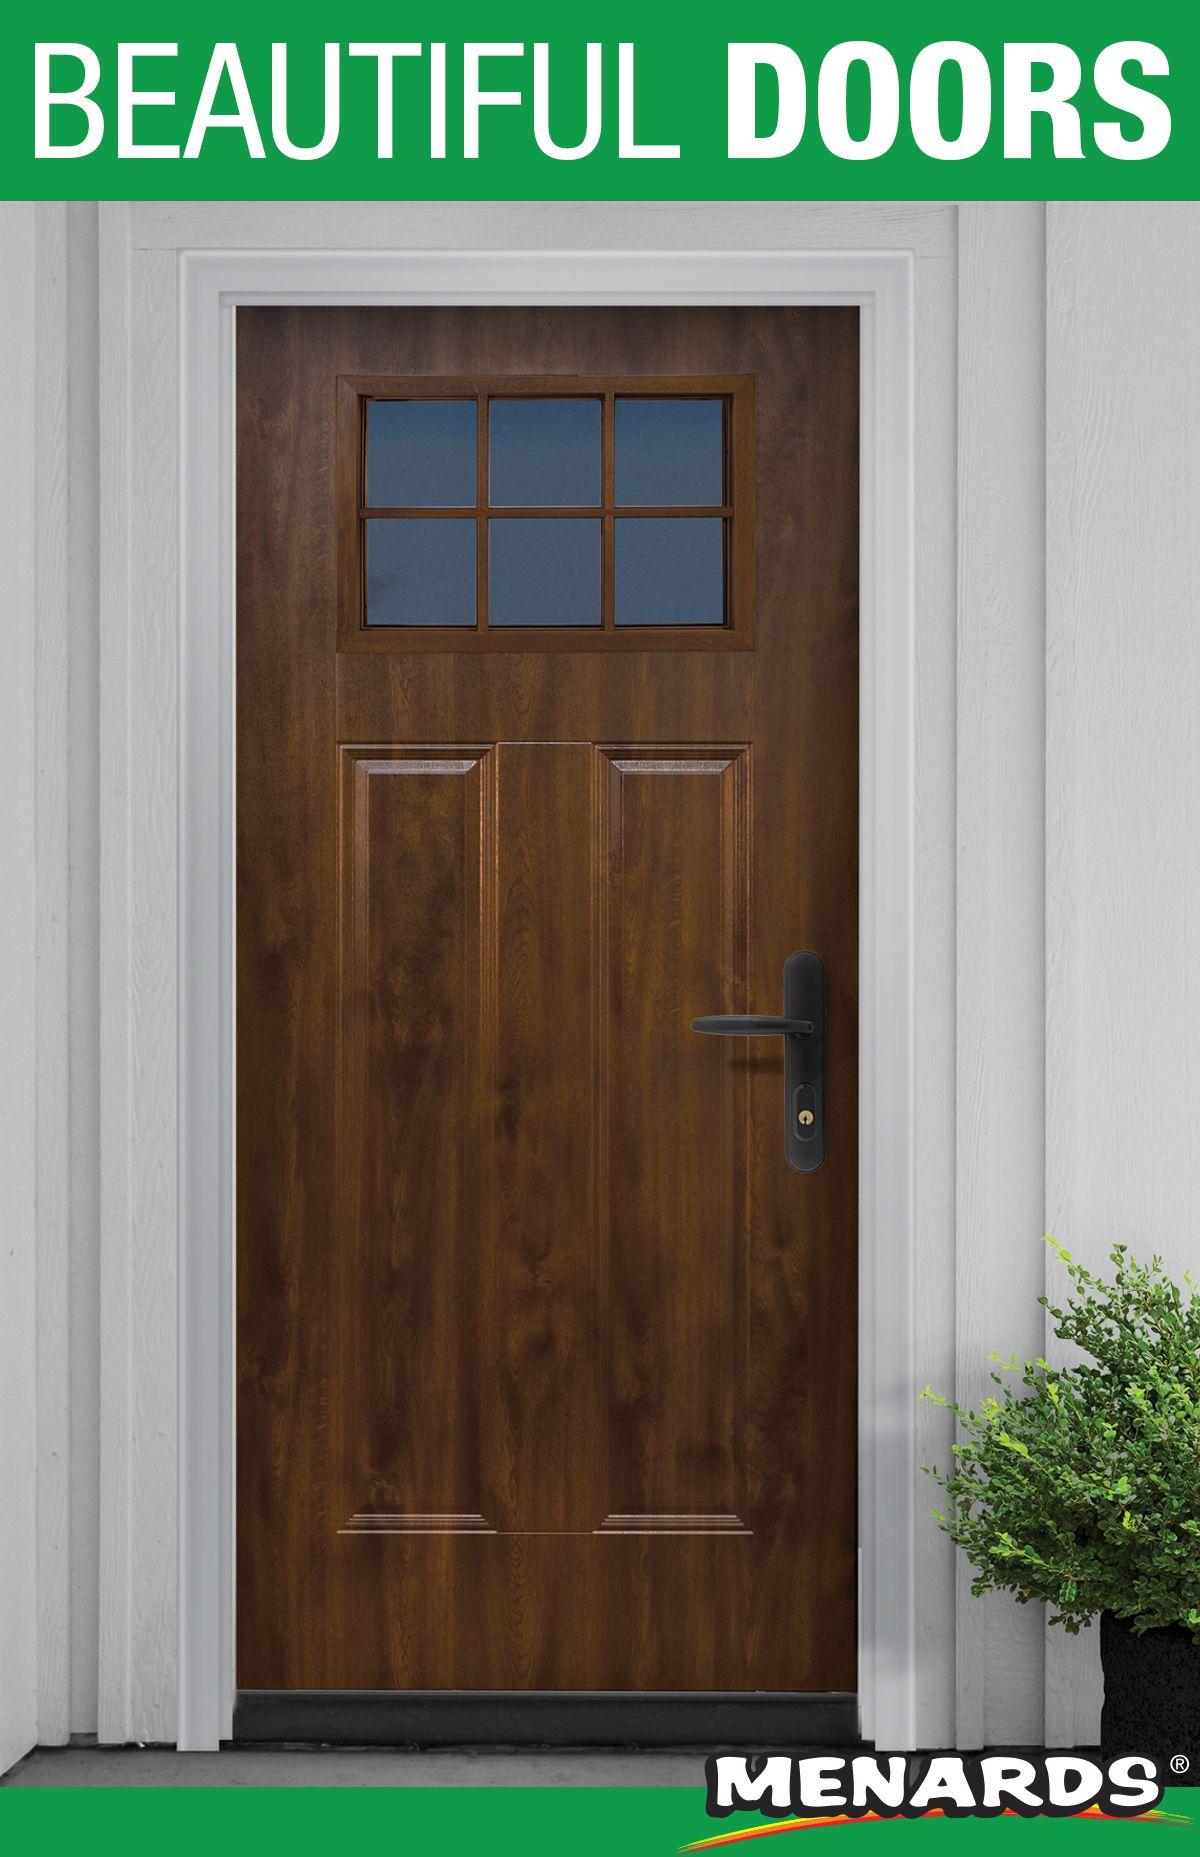 Add Beauty And Quality To Your Entryway With A Mastercraft Door This Mission Steel Door Comes Prefinished In A Dark Oak Woodg Beautiful Doors Oak Doors Doors